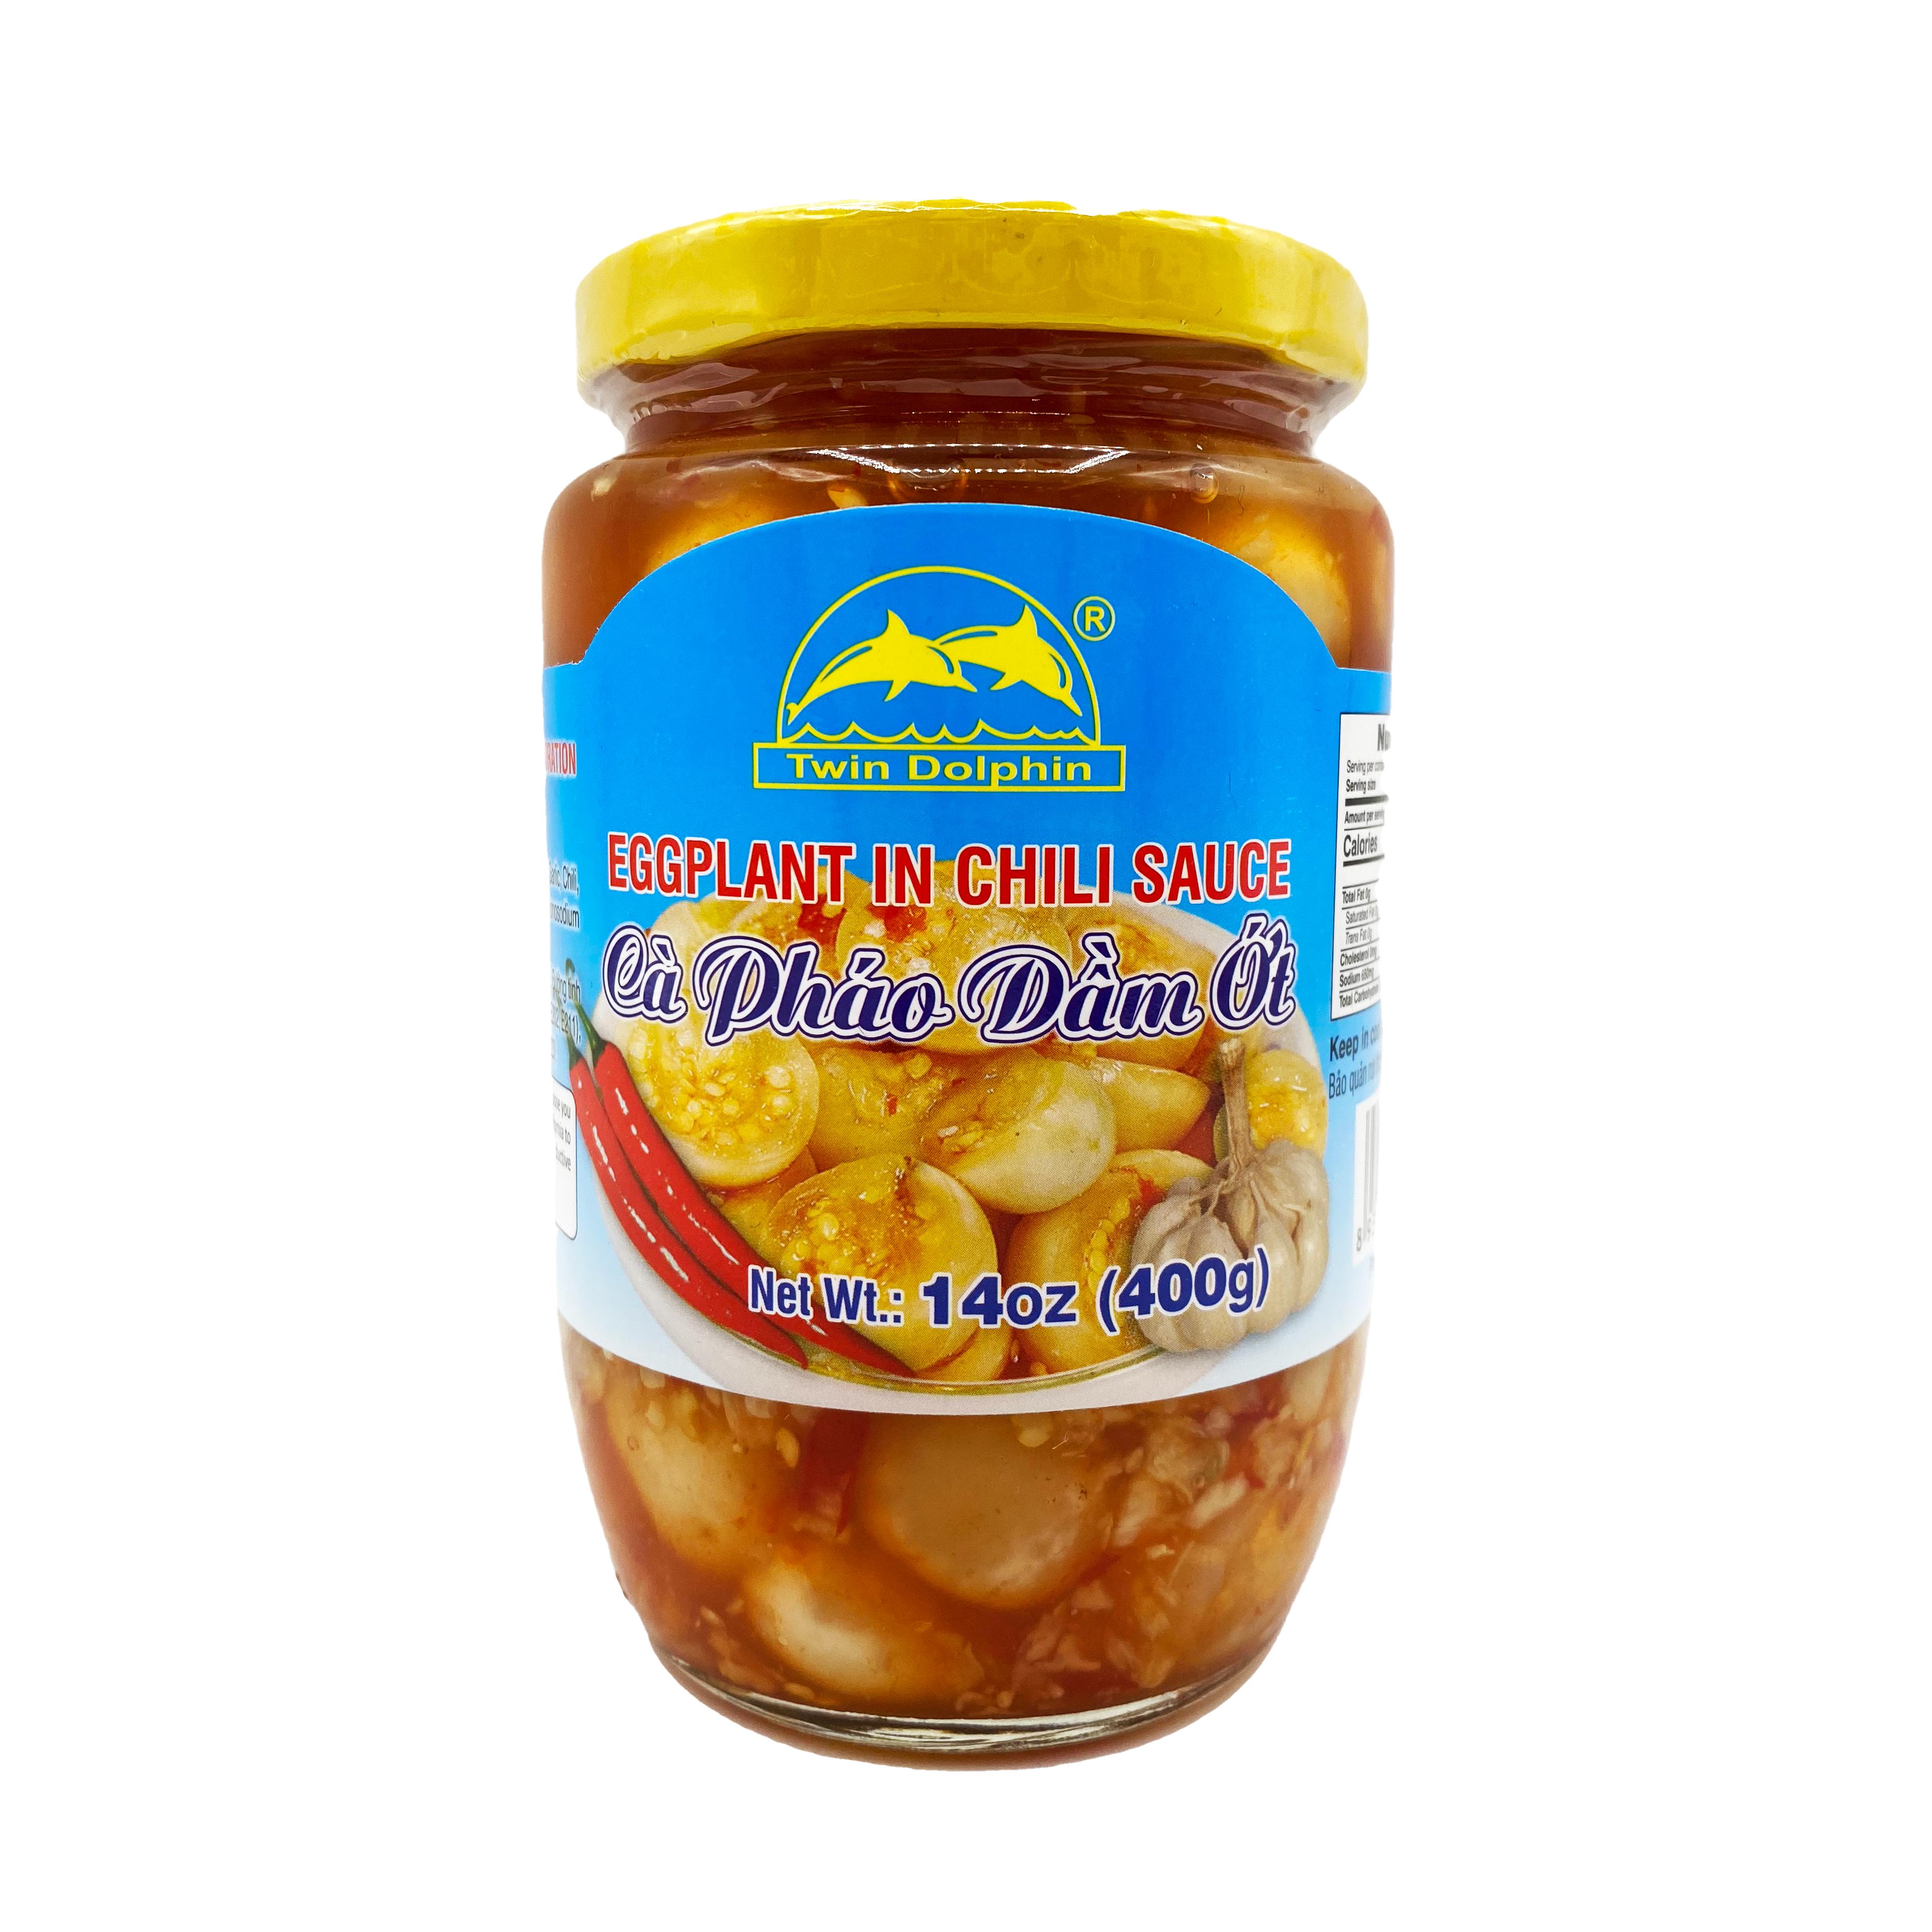 TWIN DOLPHIN Eggplant In Chili Sauce / Ca Phao Dam Ot 14 OZ